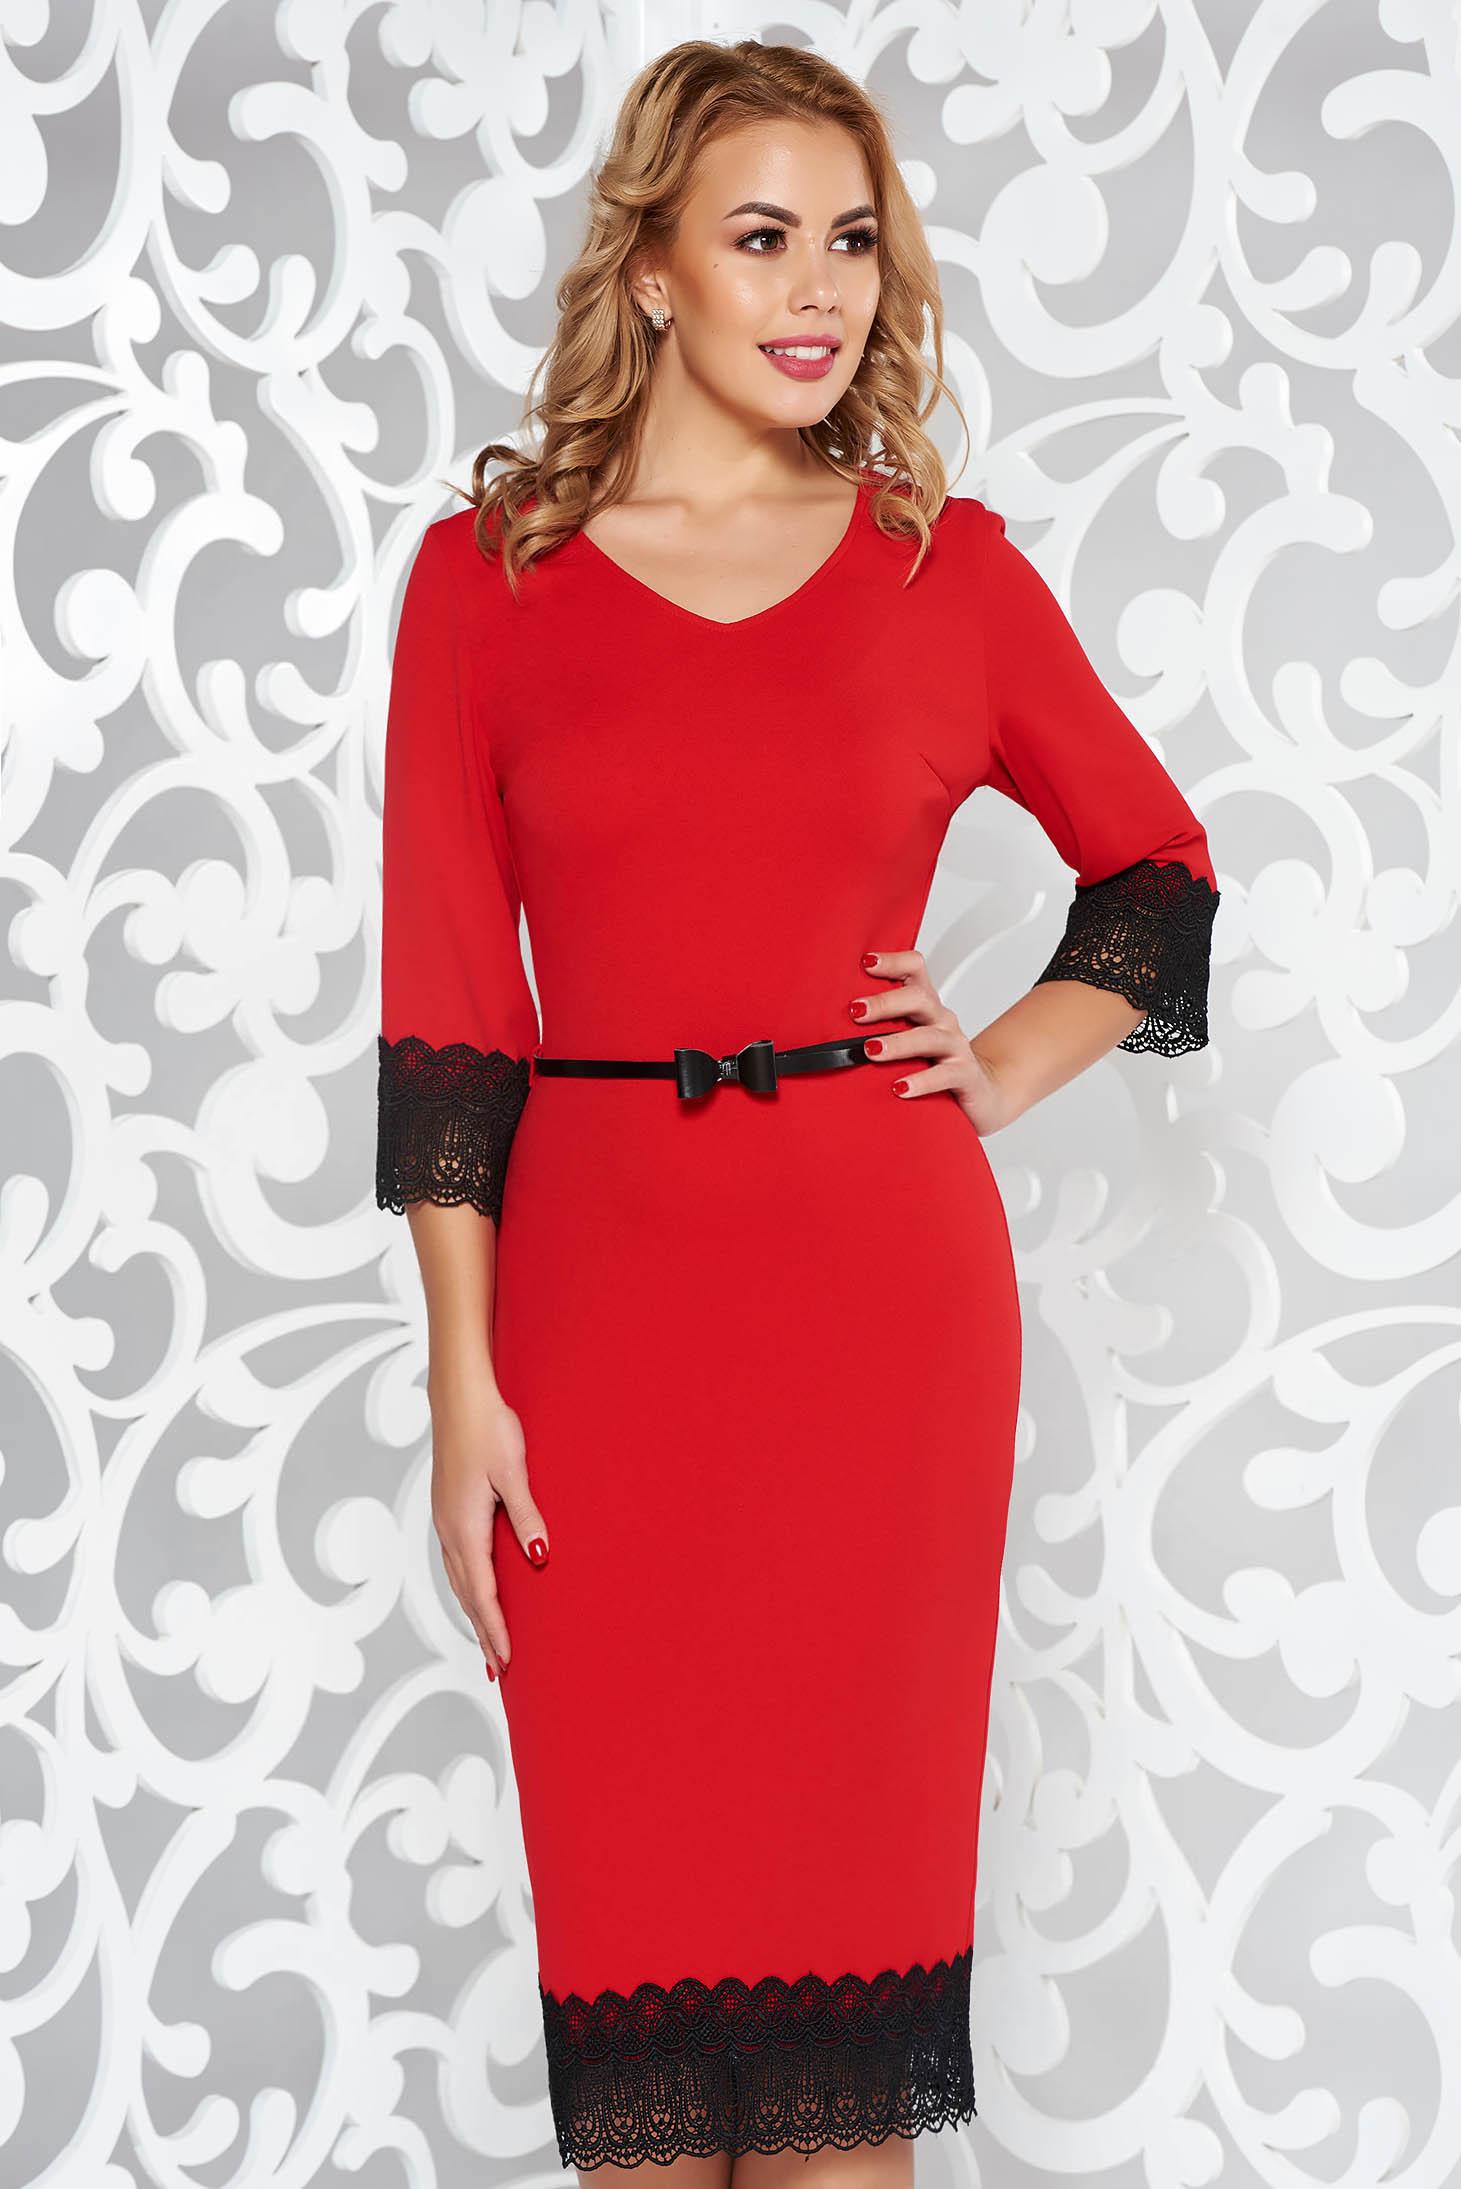 Rochie rosie eleganta tip creion din material elastic cu aplicatii de dantela si accesoriu tip curea